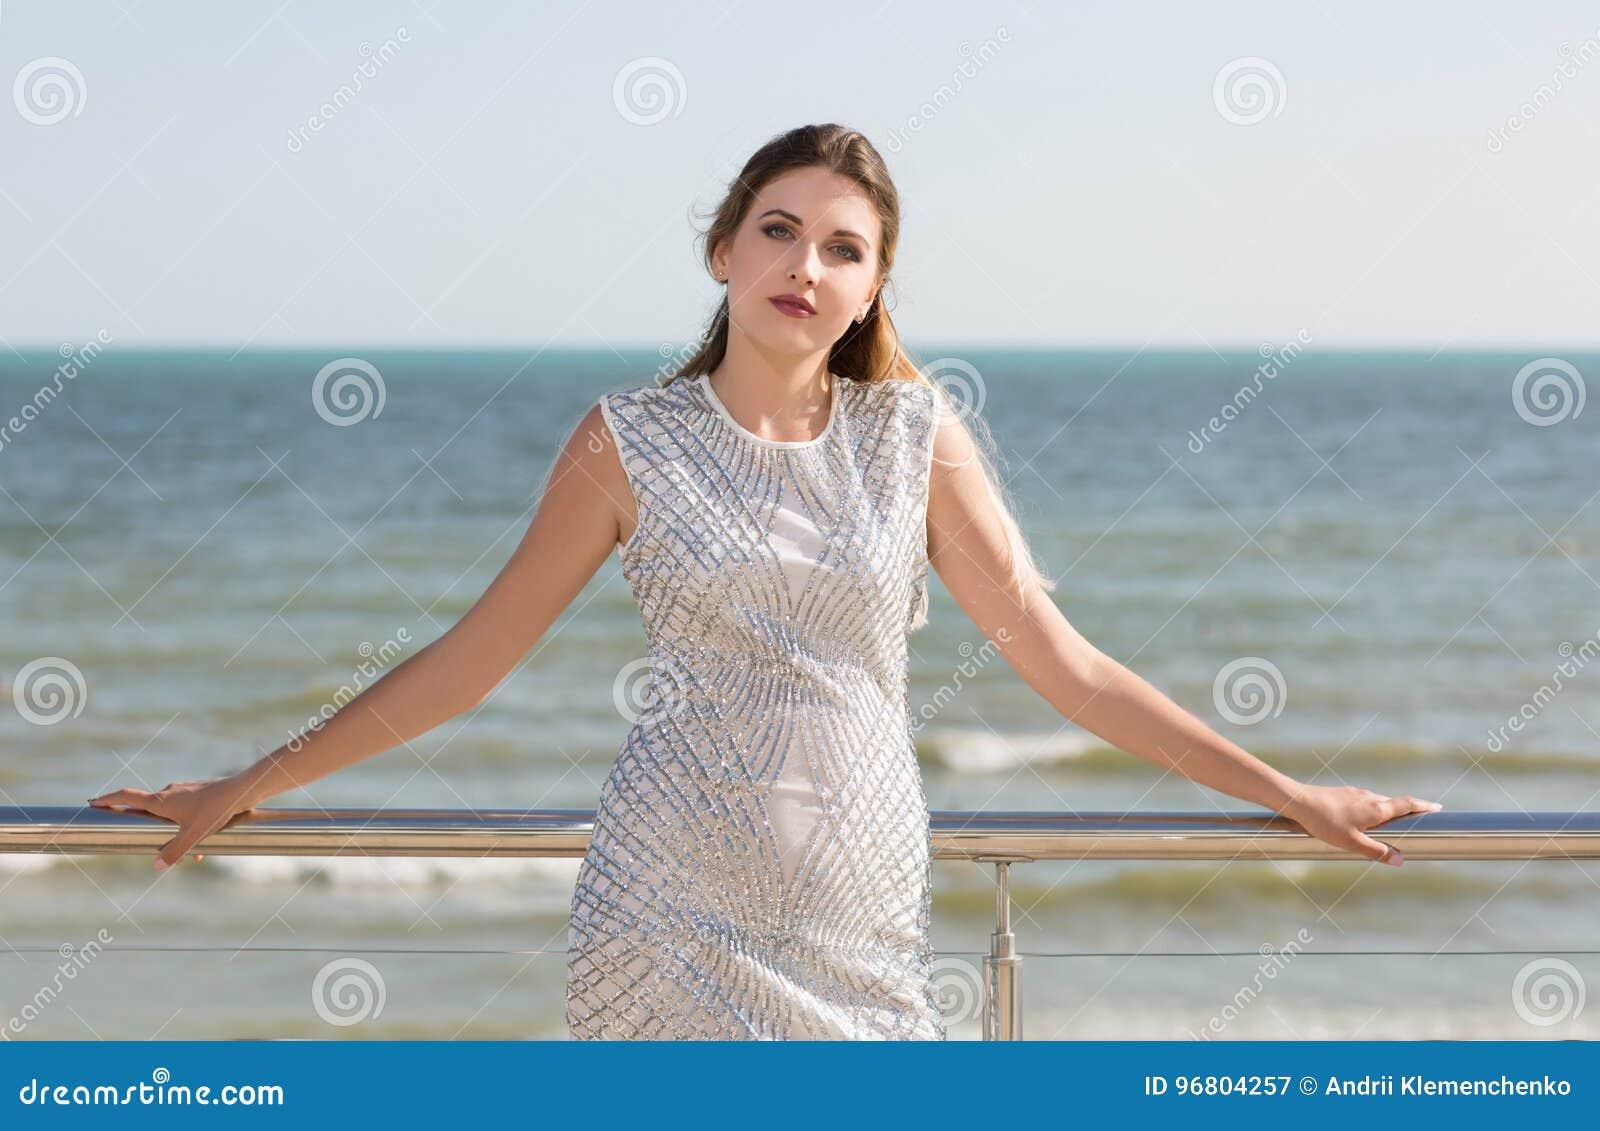 57fd1a04a853 Μια χαριτωμένη πρότυπη γυναίκα σε ένα φωτεινό μπλε συναρπαστικό υπόβαθρο  θάλασσας Γοητευτική κυρία σε ένα χαλαρό άσπρο φόρεμα με τα μπλε σχέδια  κοντά στη ...